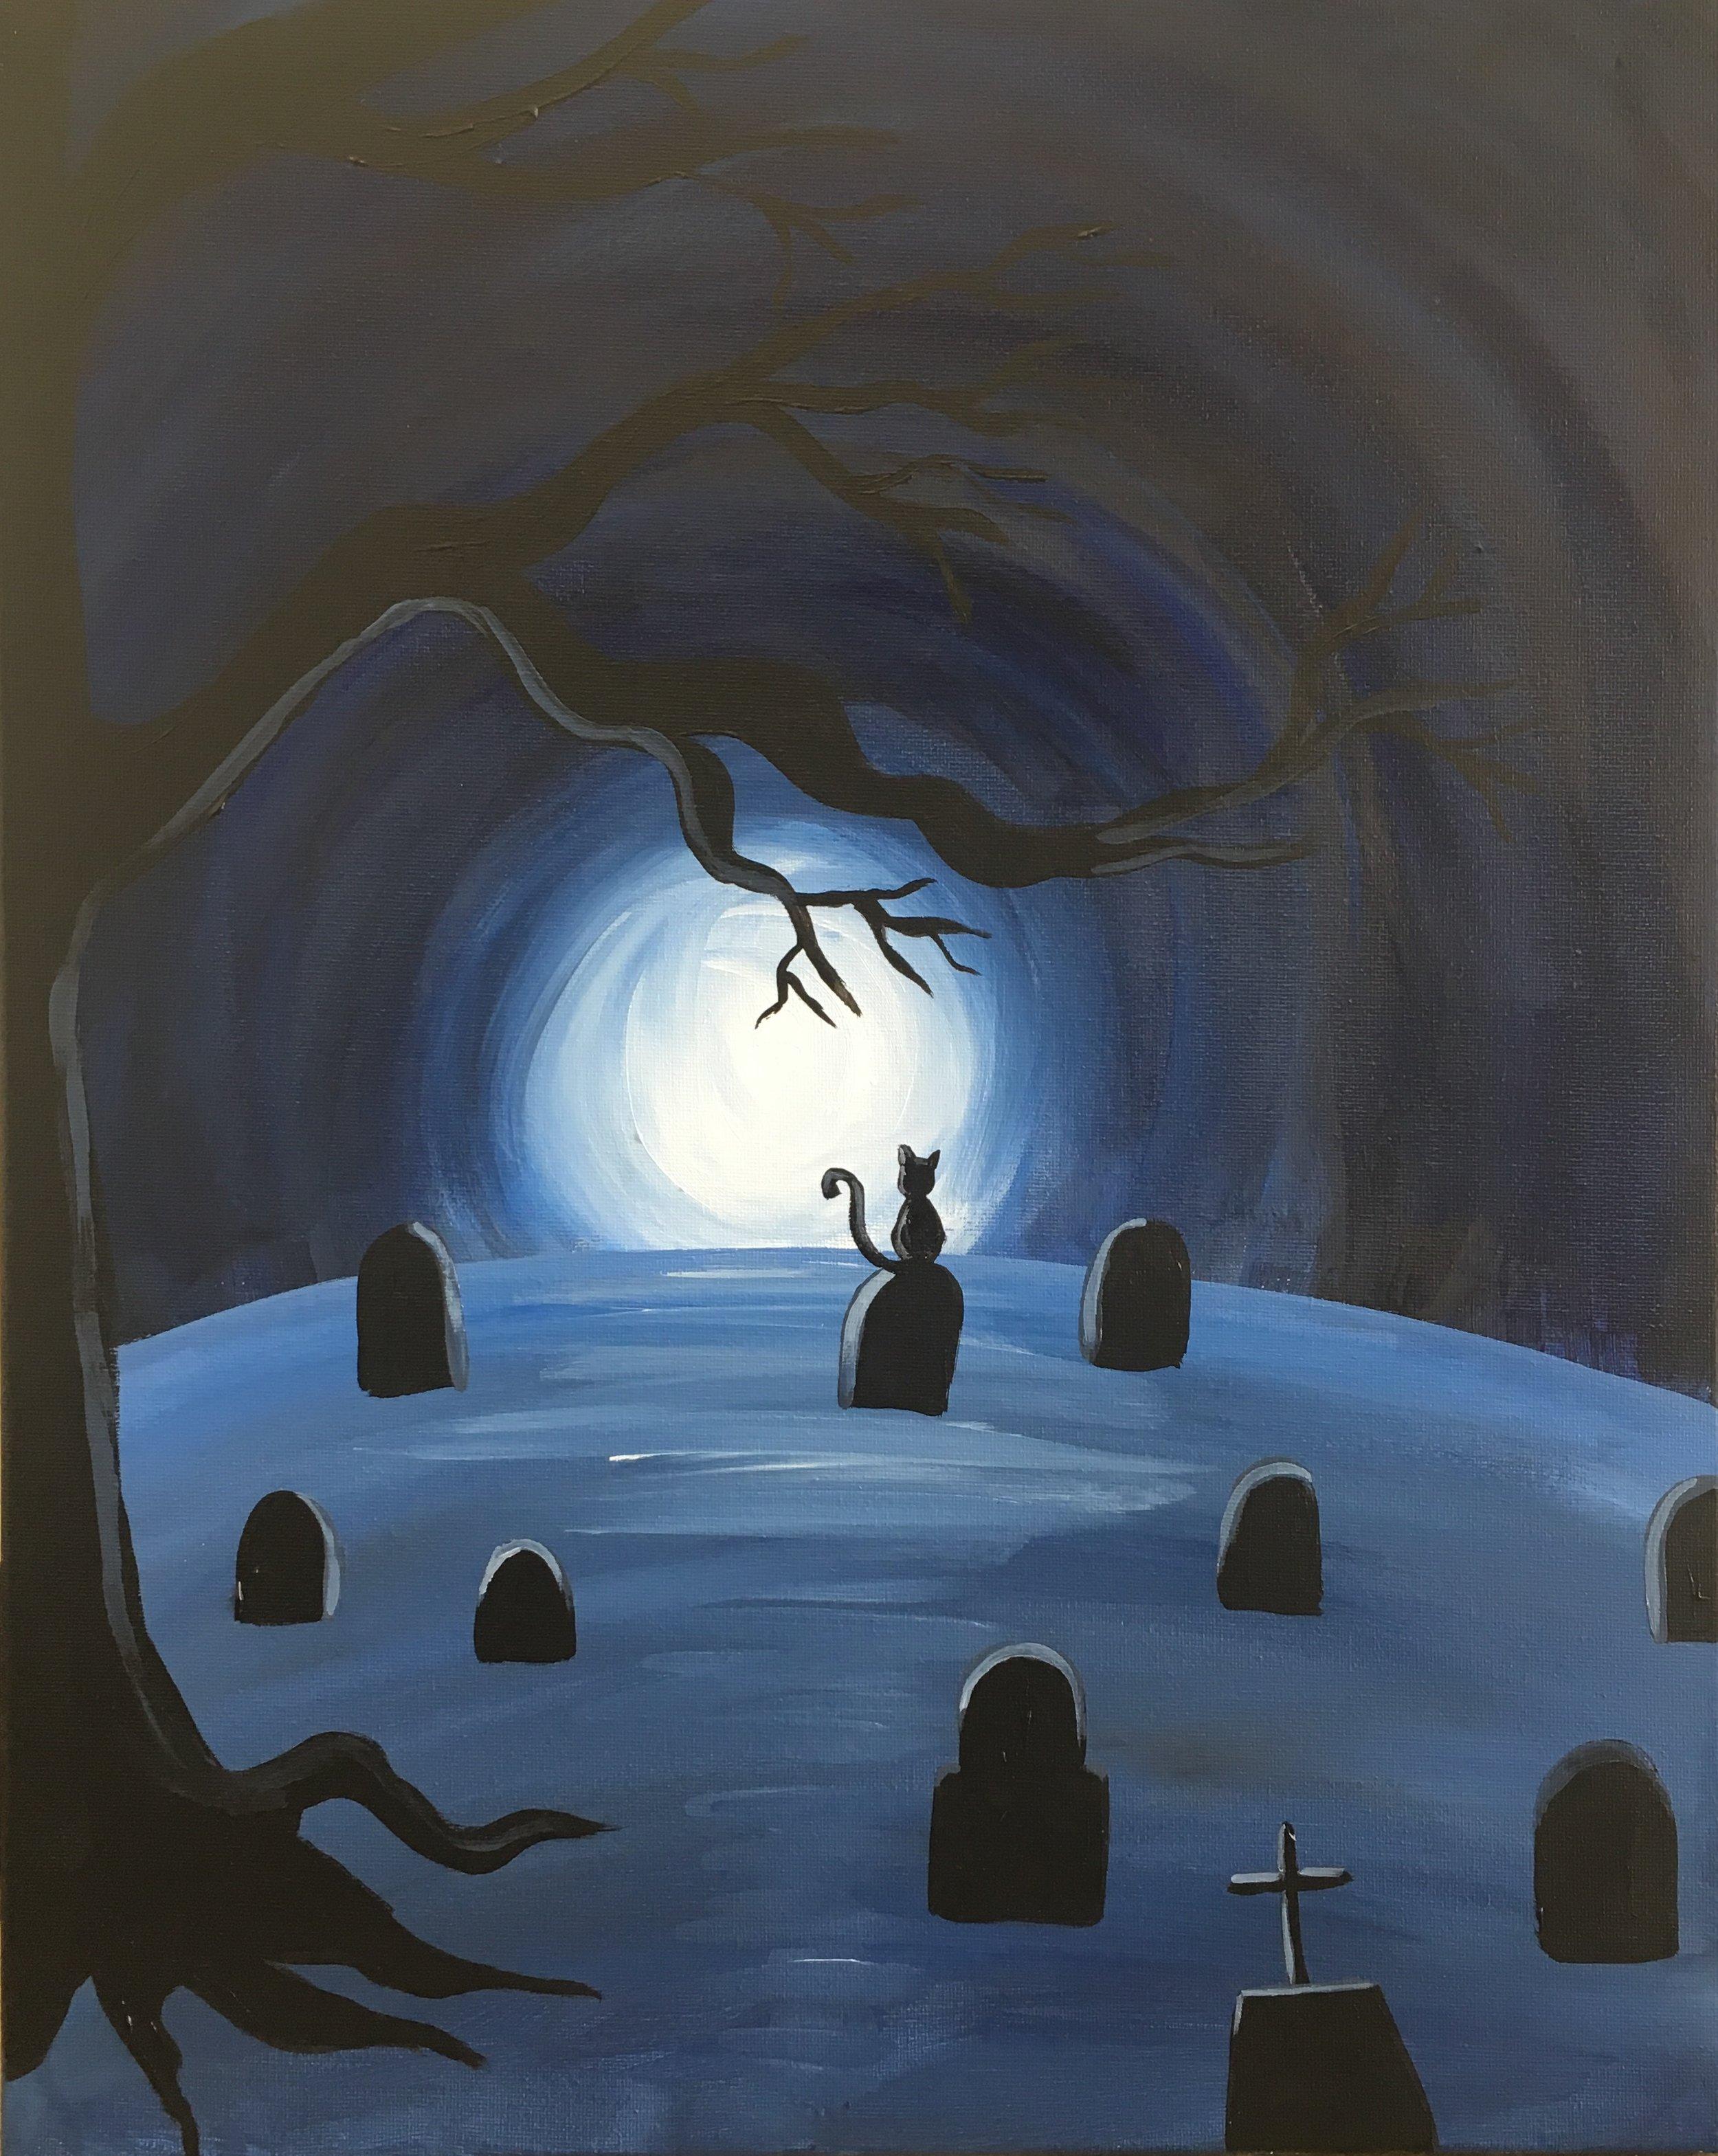 *Black Cat in Spooky Graveyard